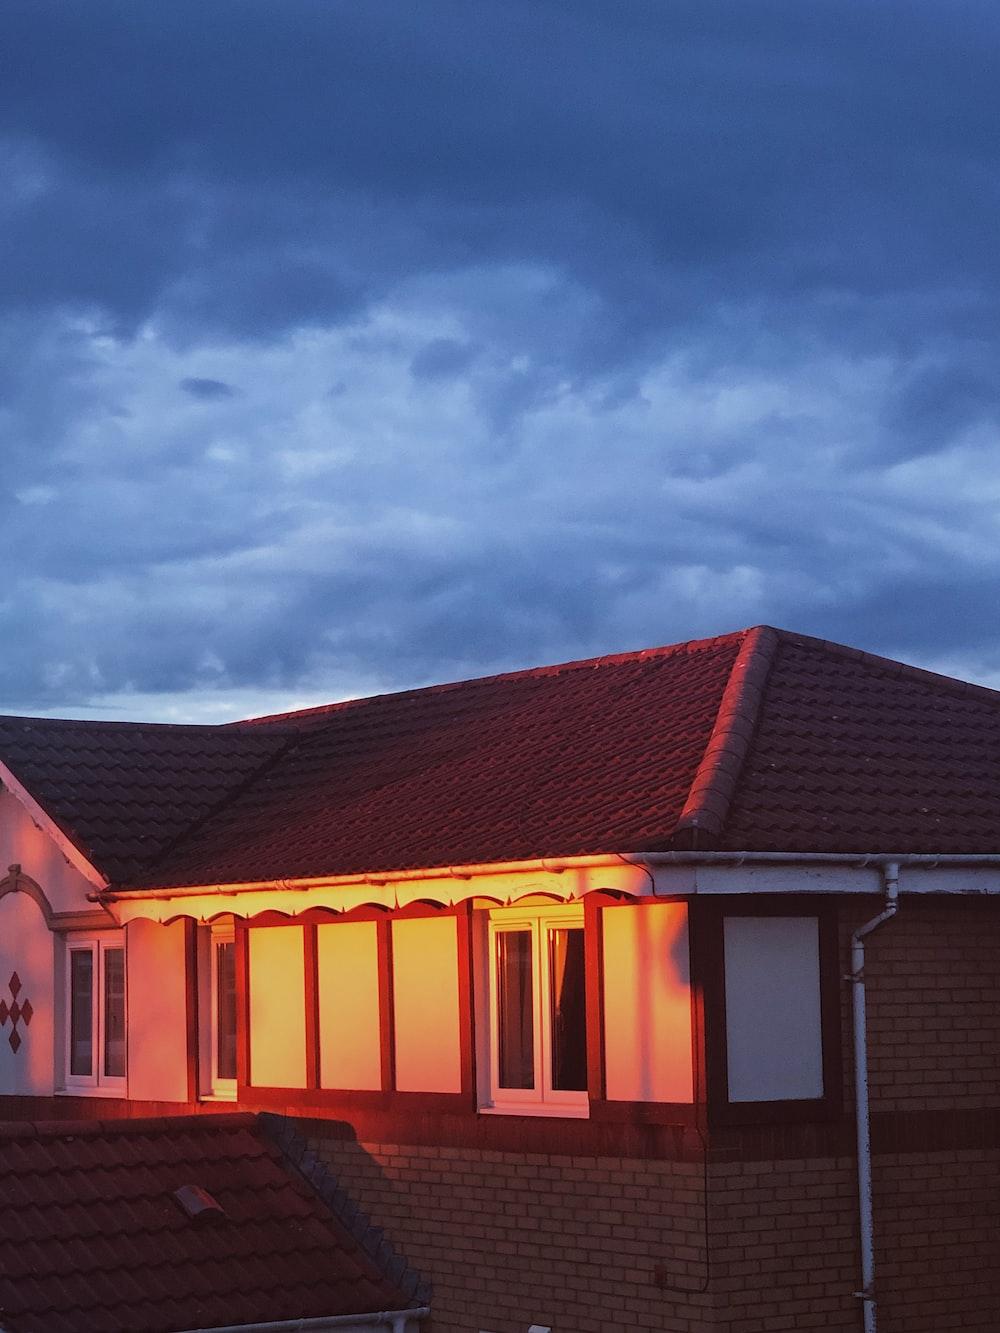 maroon house under cloudy sky